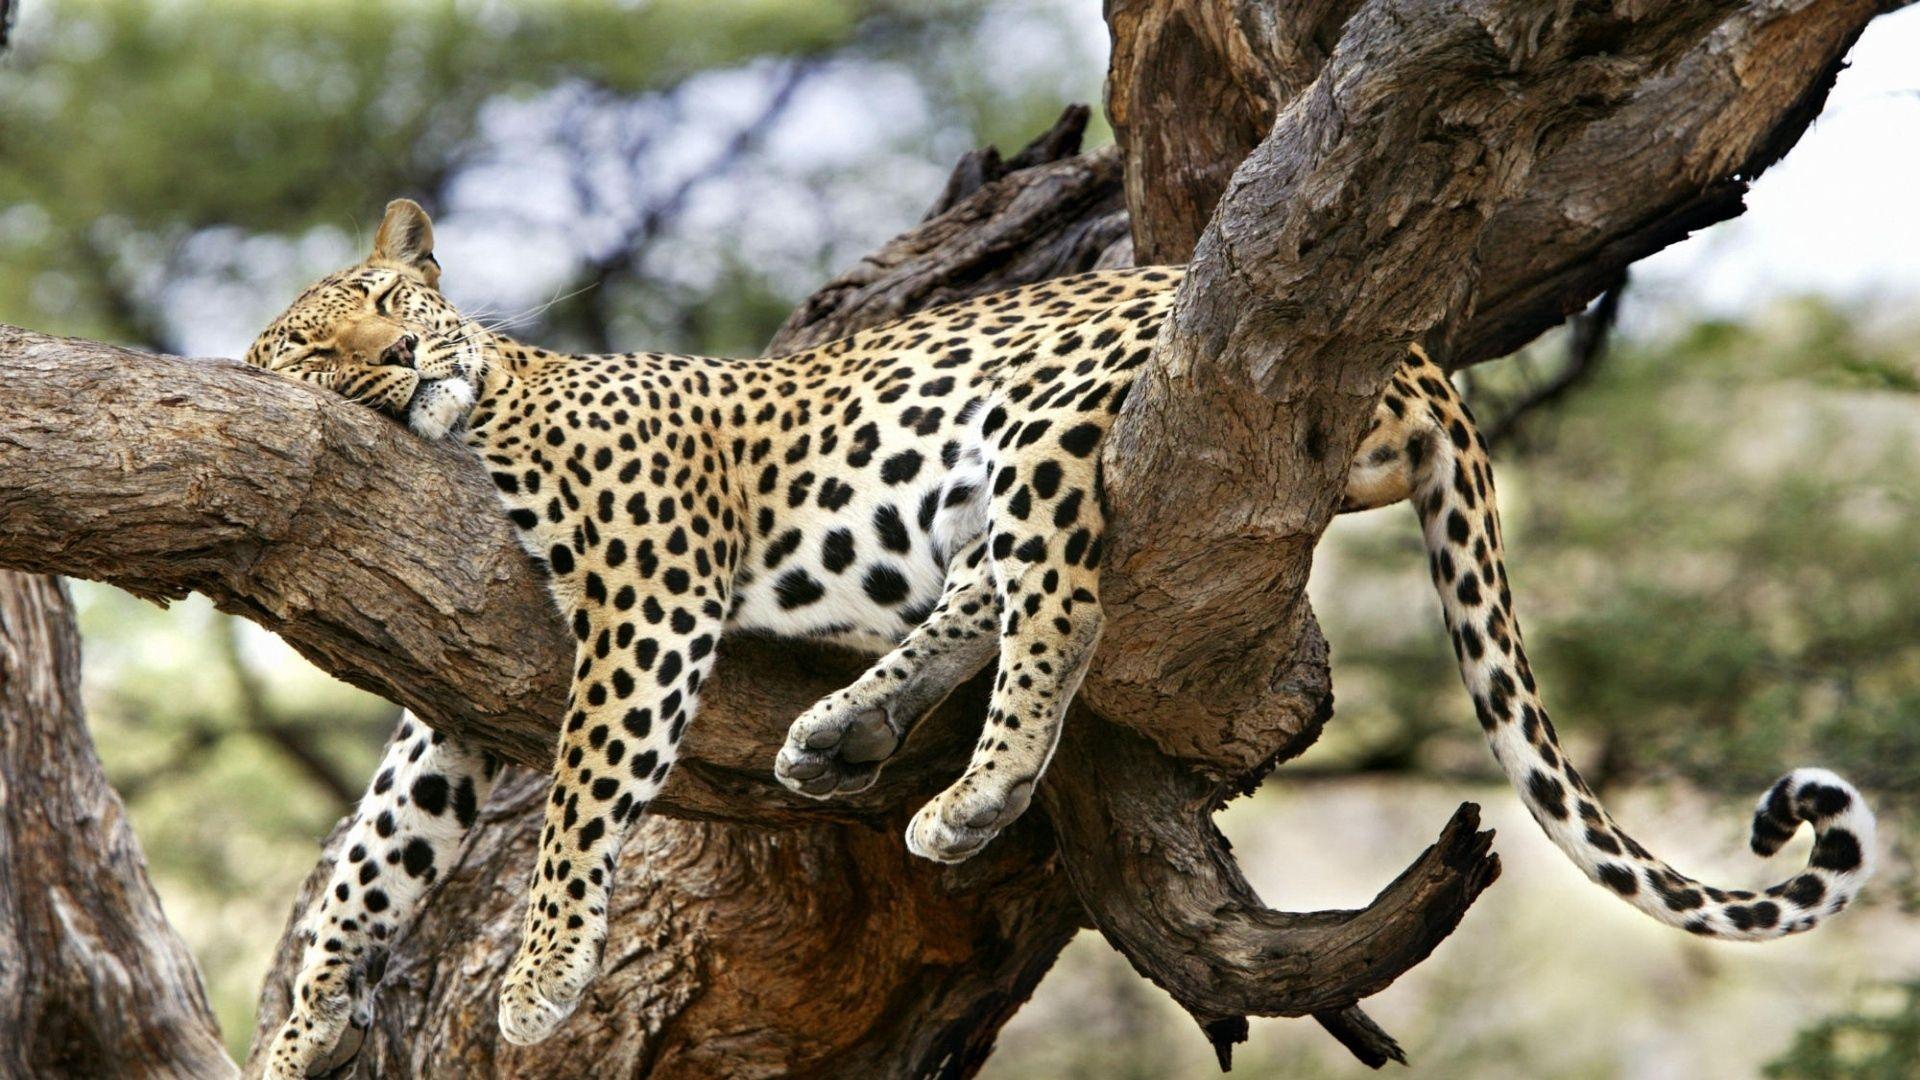 Leopard Lying Big Cat, Predator Wallpapers Full Hd, Hdtv